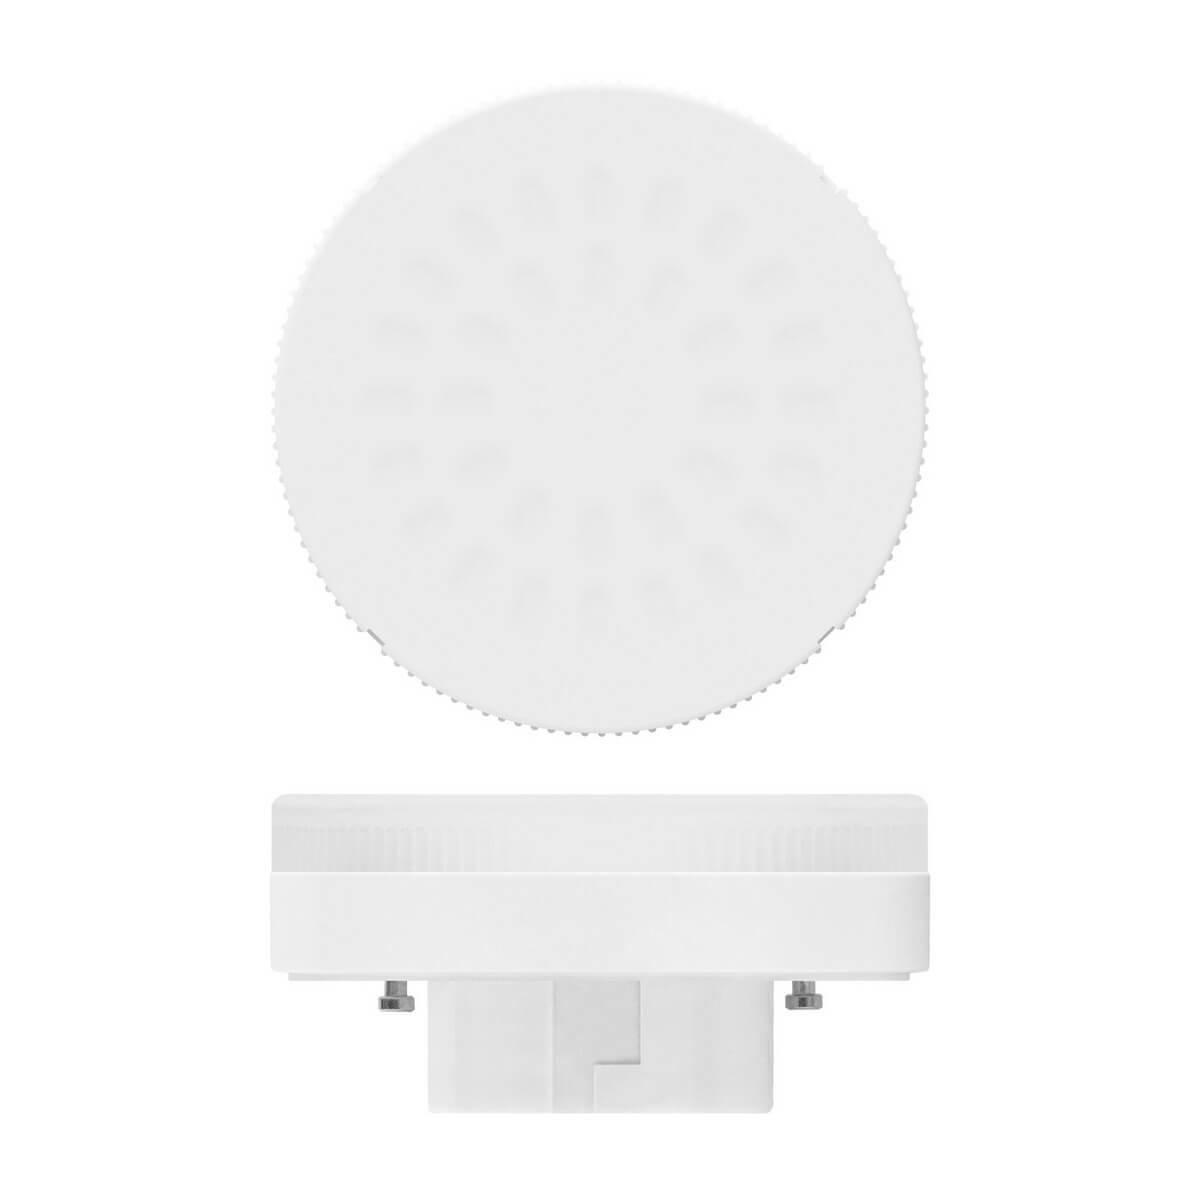 купить Лампа светодиодная (UL-00001669) Uniel GX53 6W 4000K матовая LED-GX53-6W/NW/GX53/FR PLZ01WH по цене 93 рублей